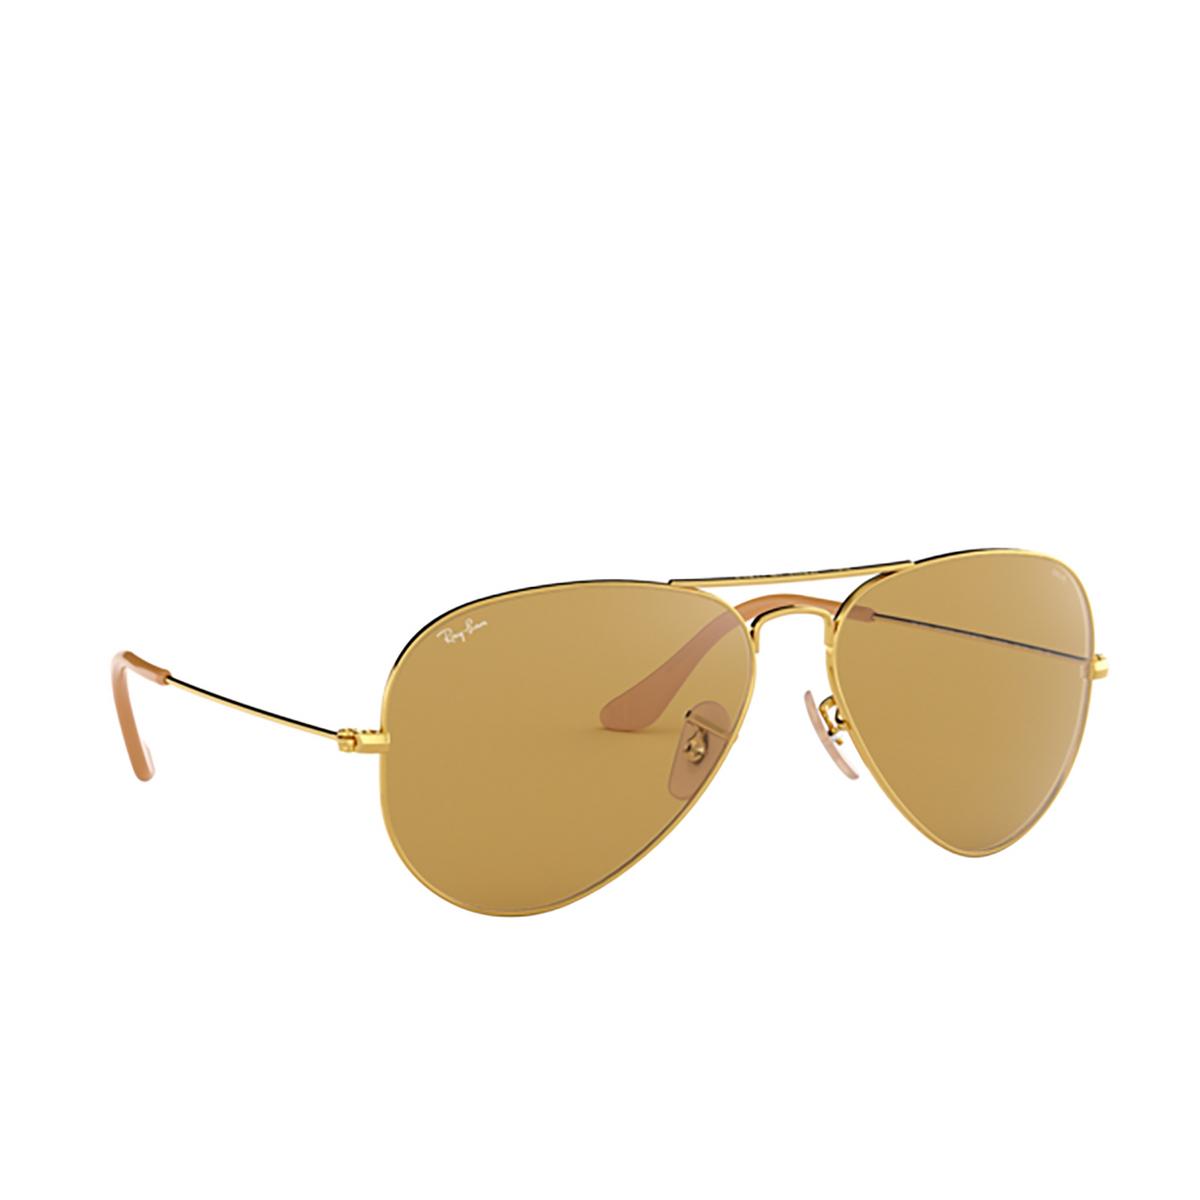 Ray-Ban® Aviator Sunglasses: Aviator Large Metal RB3025 color Arista 90644I - three-quarters view.